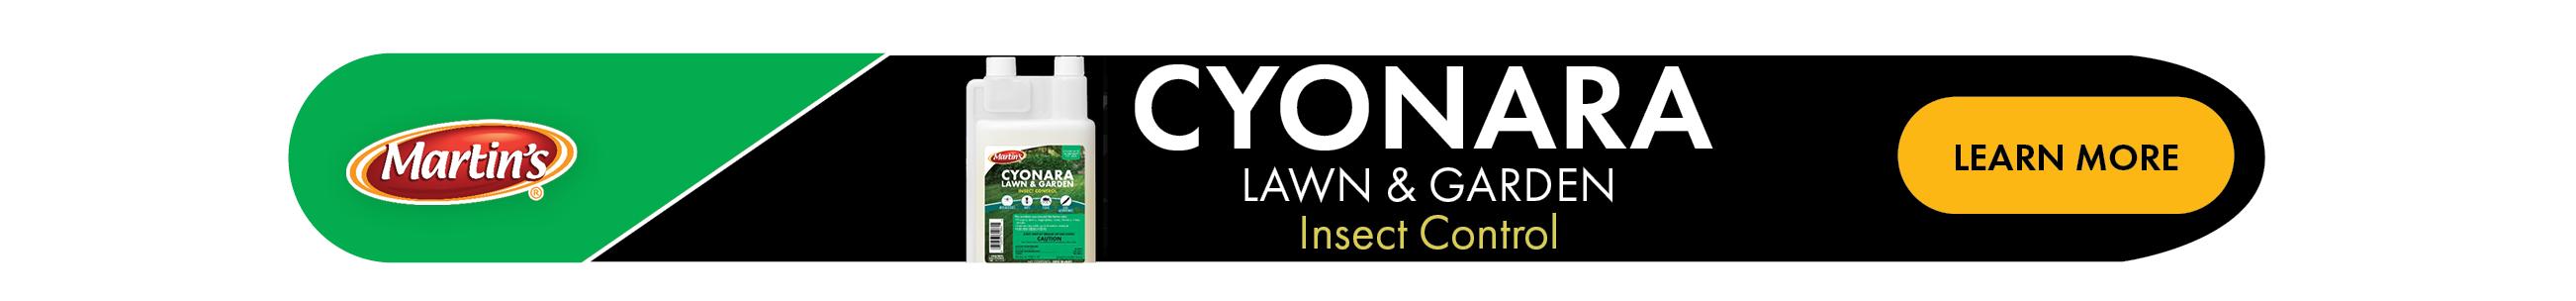 Cyonara Lawn and Garden Concentrate